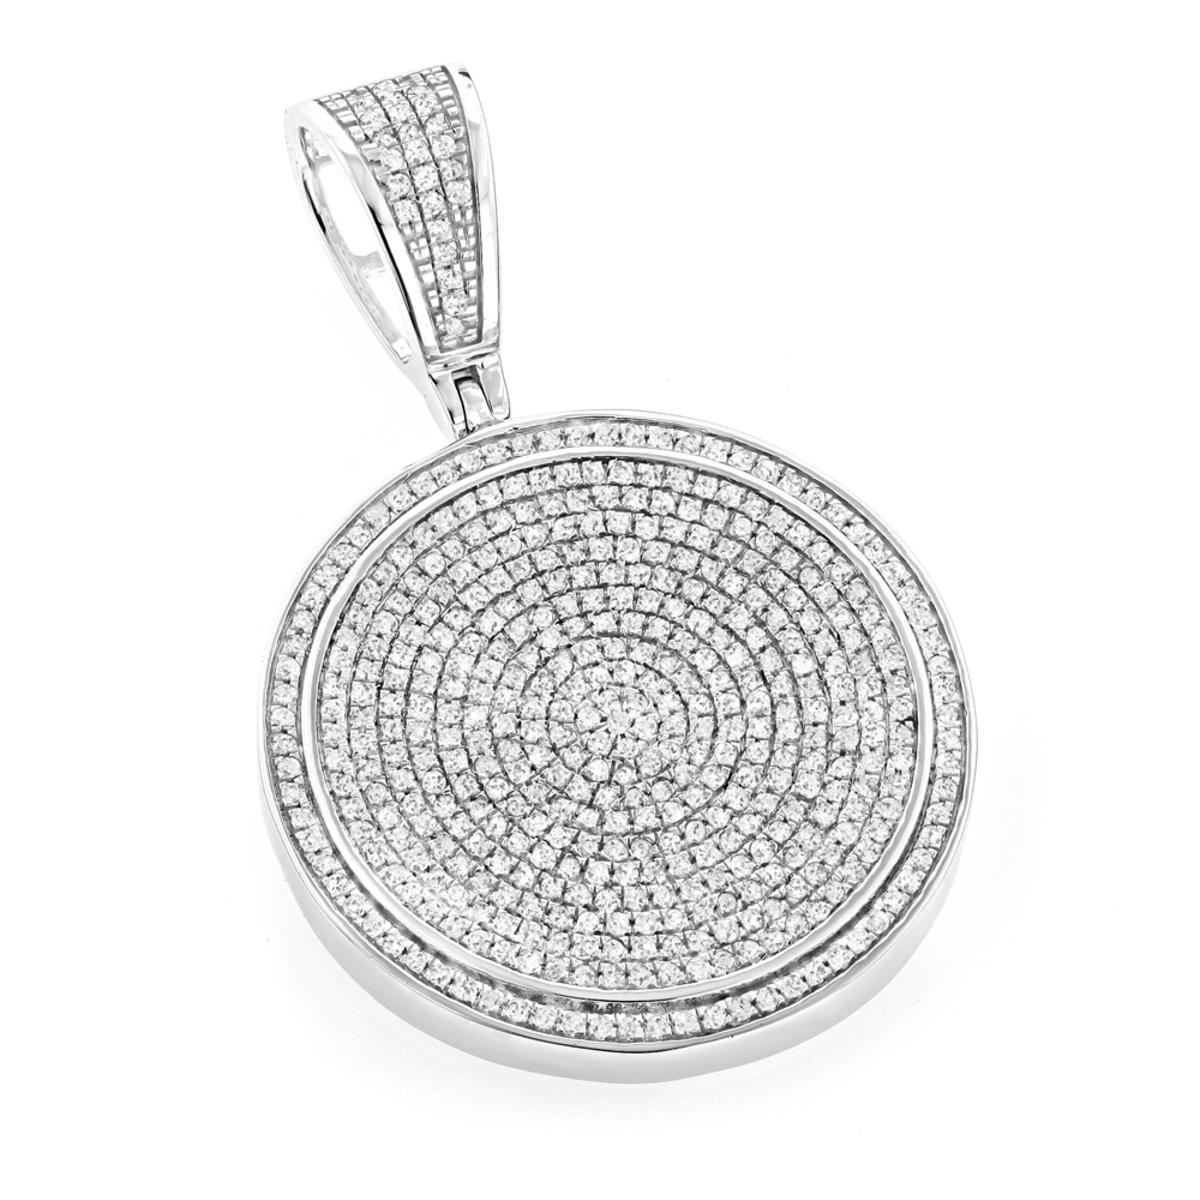 Ladies 10K Gold Diamond Iced Out Medallion Pendant 1.16ct